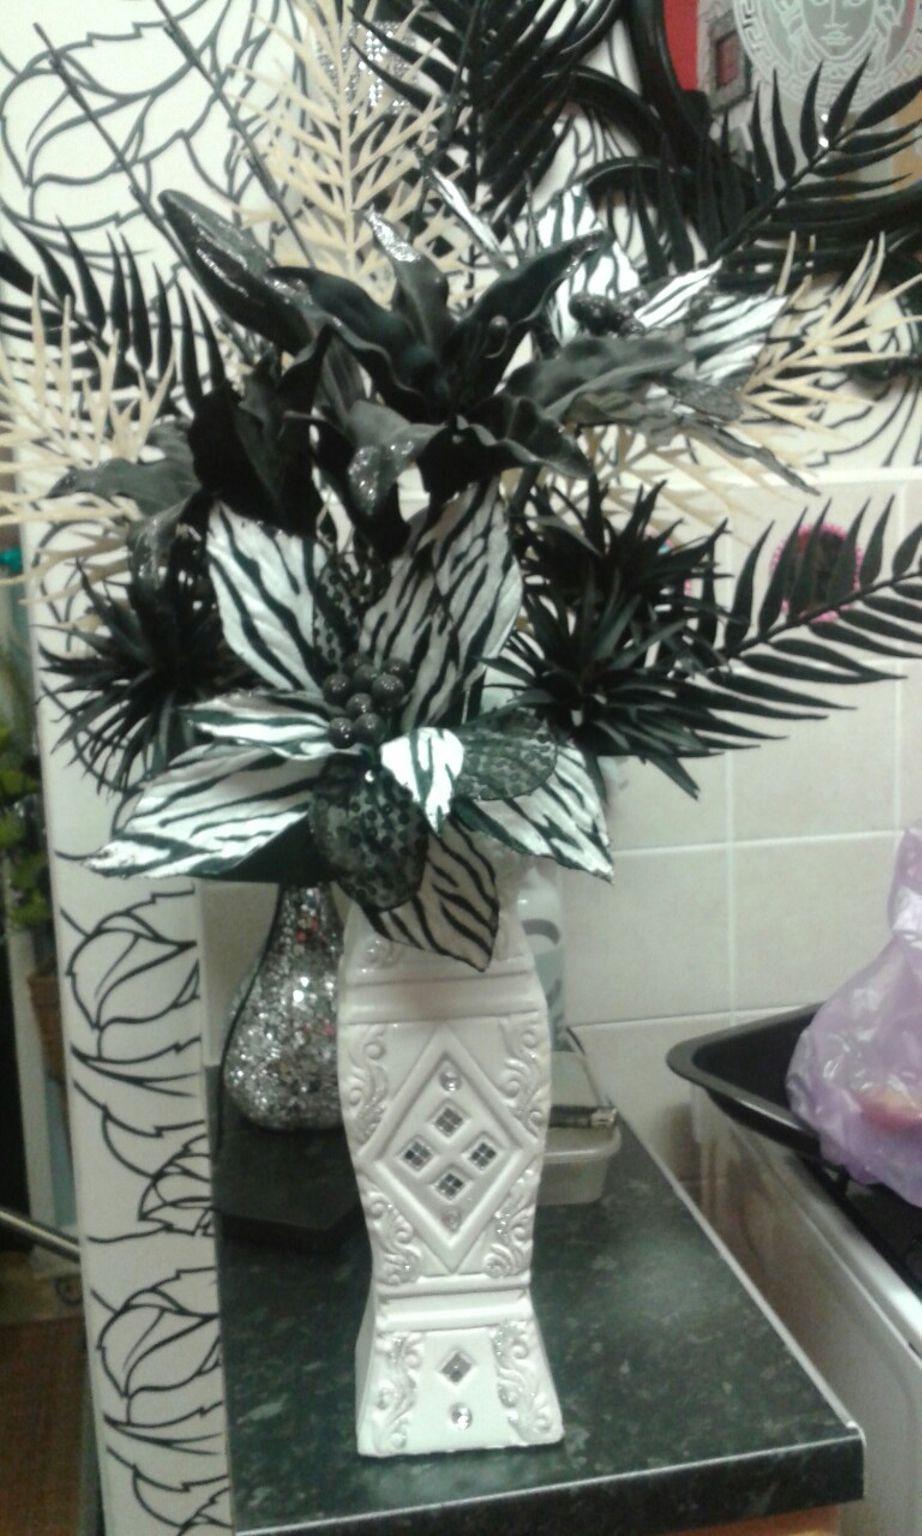 4x4 square vase of https en shpock com i wsp8sebccdzdaok1 2018 04 04t001557 within flowers in vase with lights 615de0a8